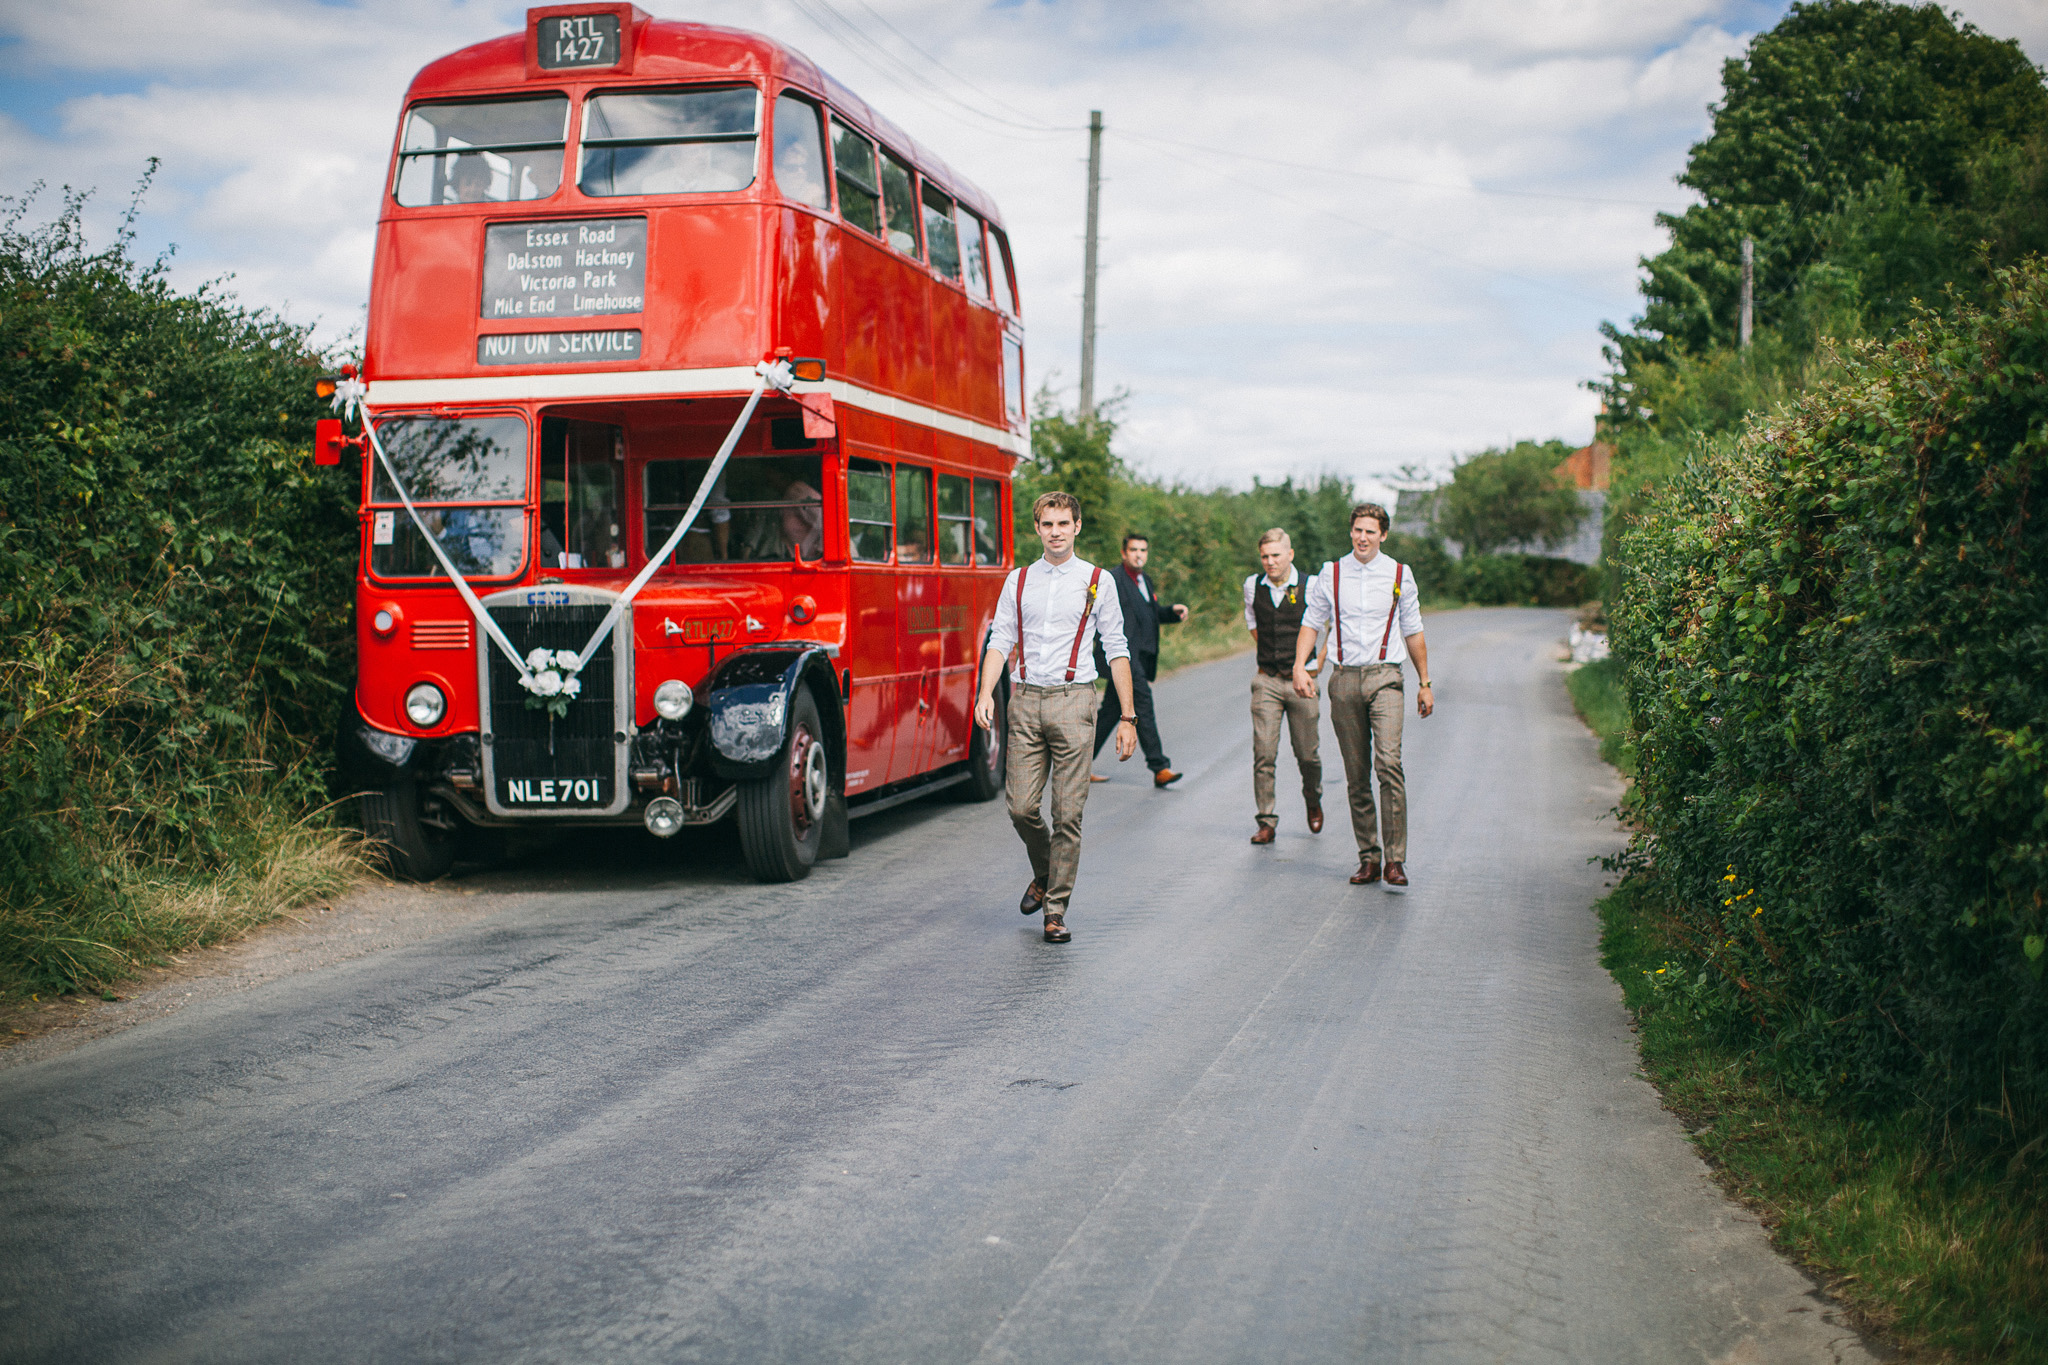 chantry_sussex_barn_wedding_298.jpg